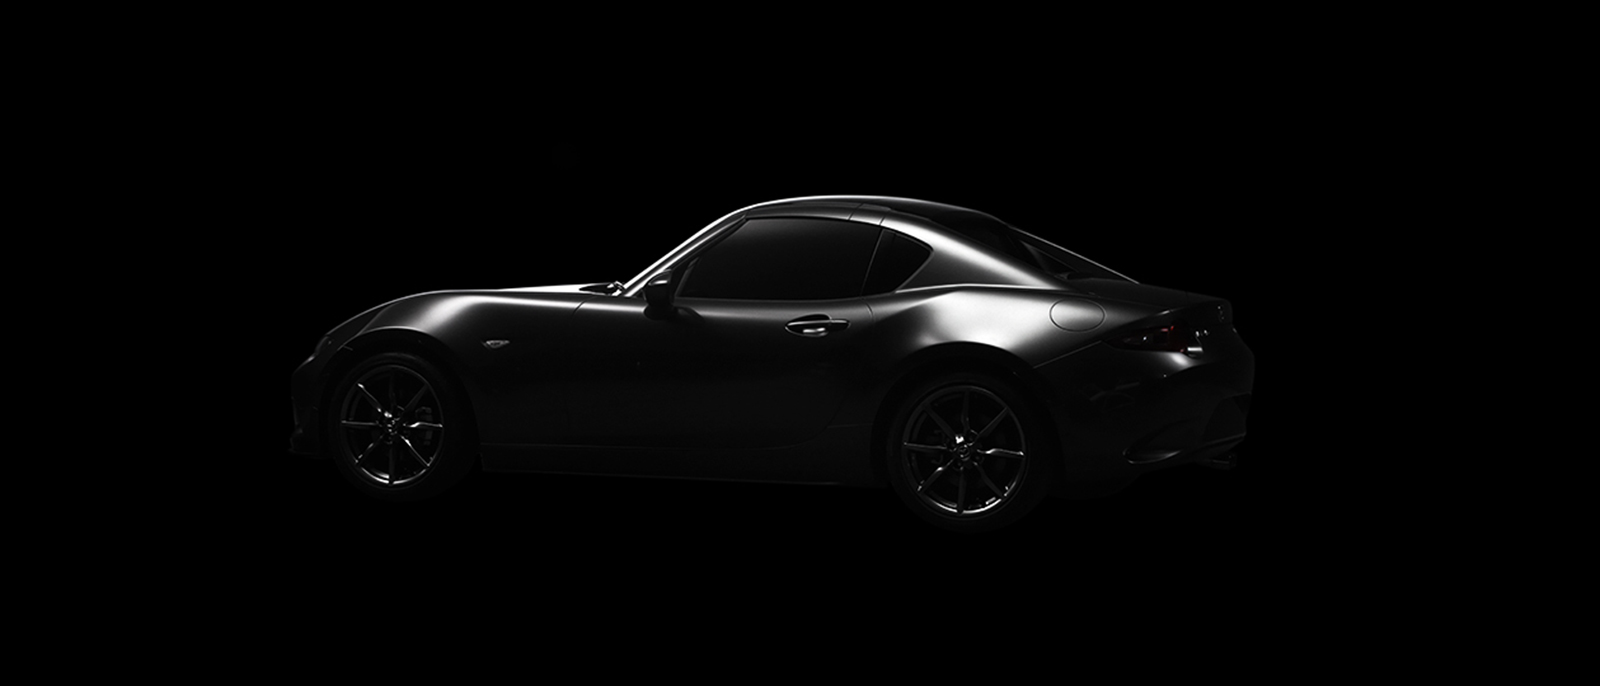 2016 Mazda MX-5 RF side view